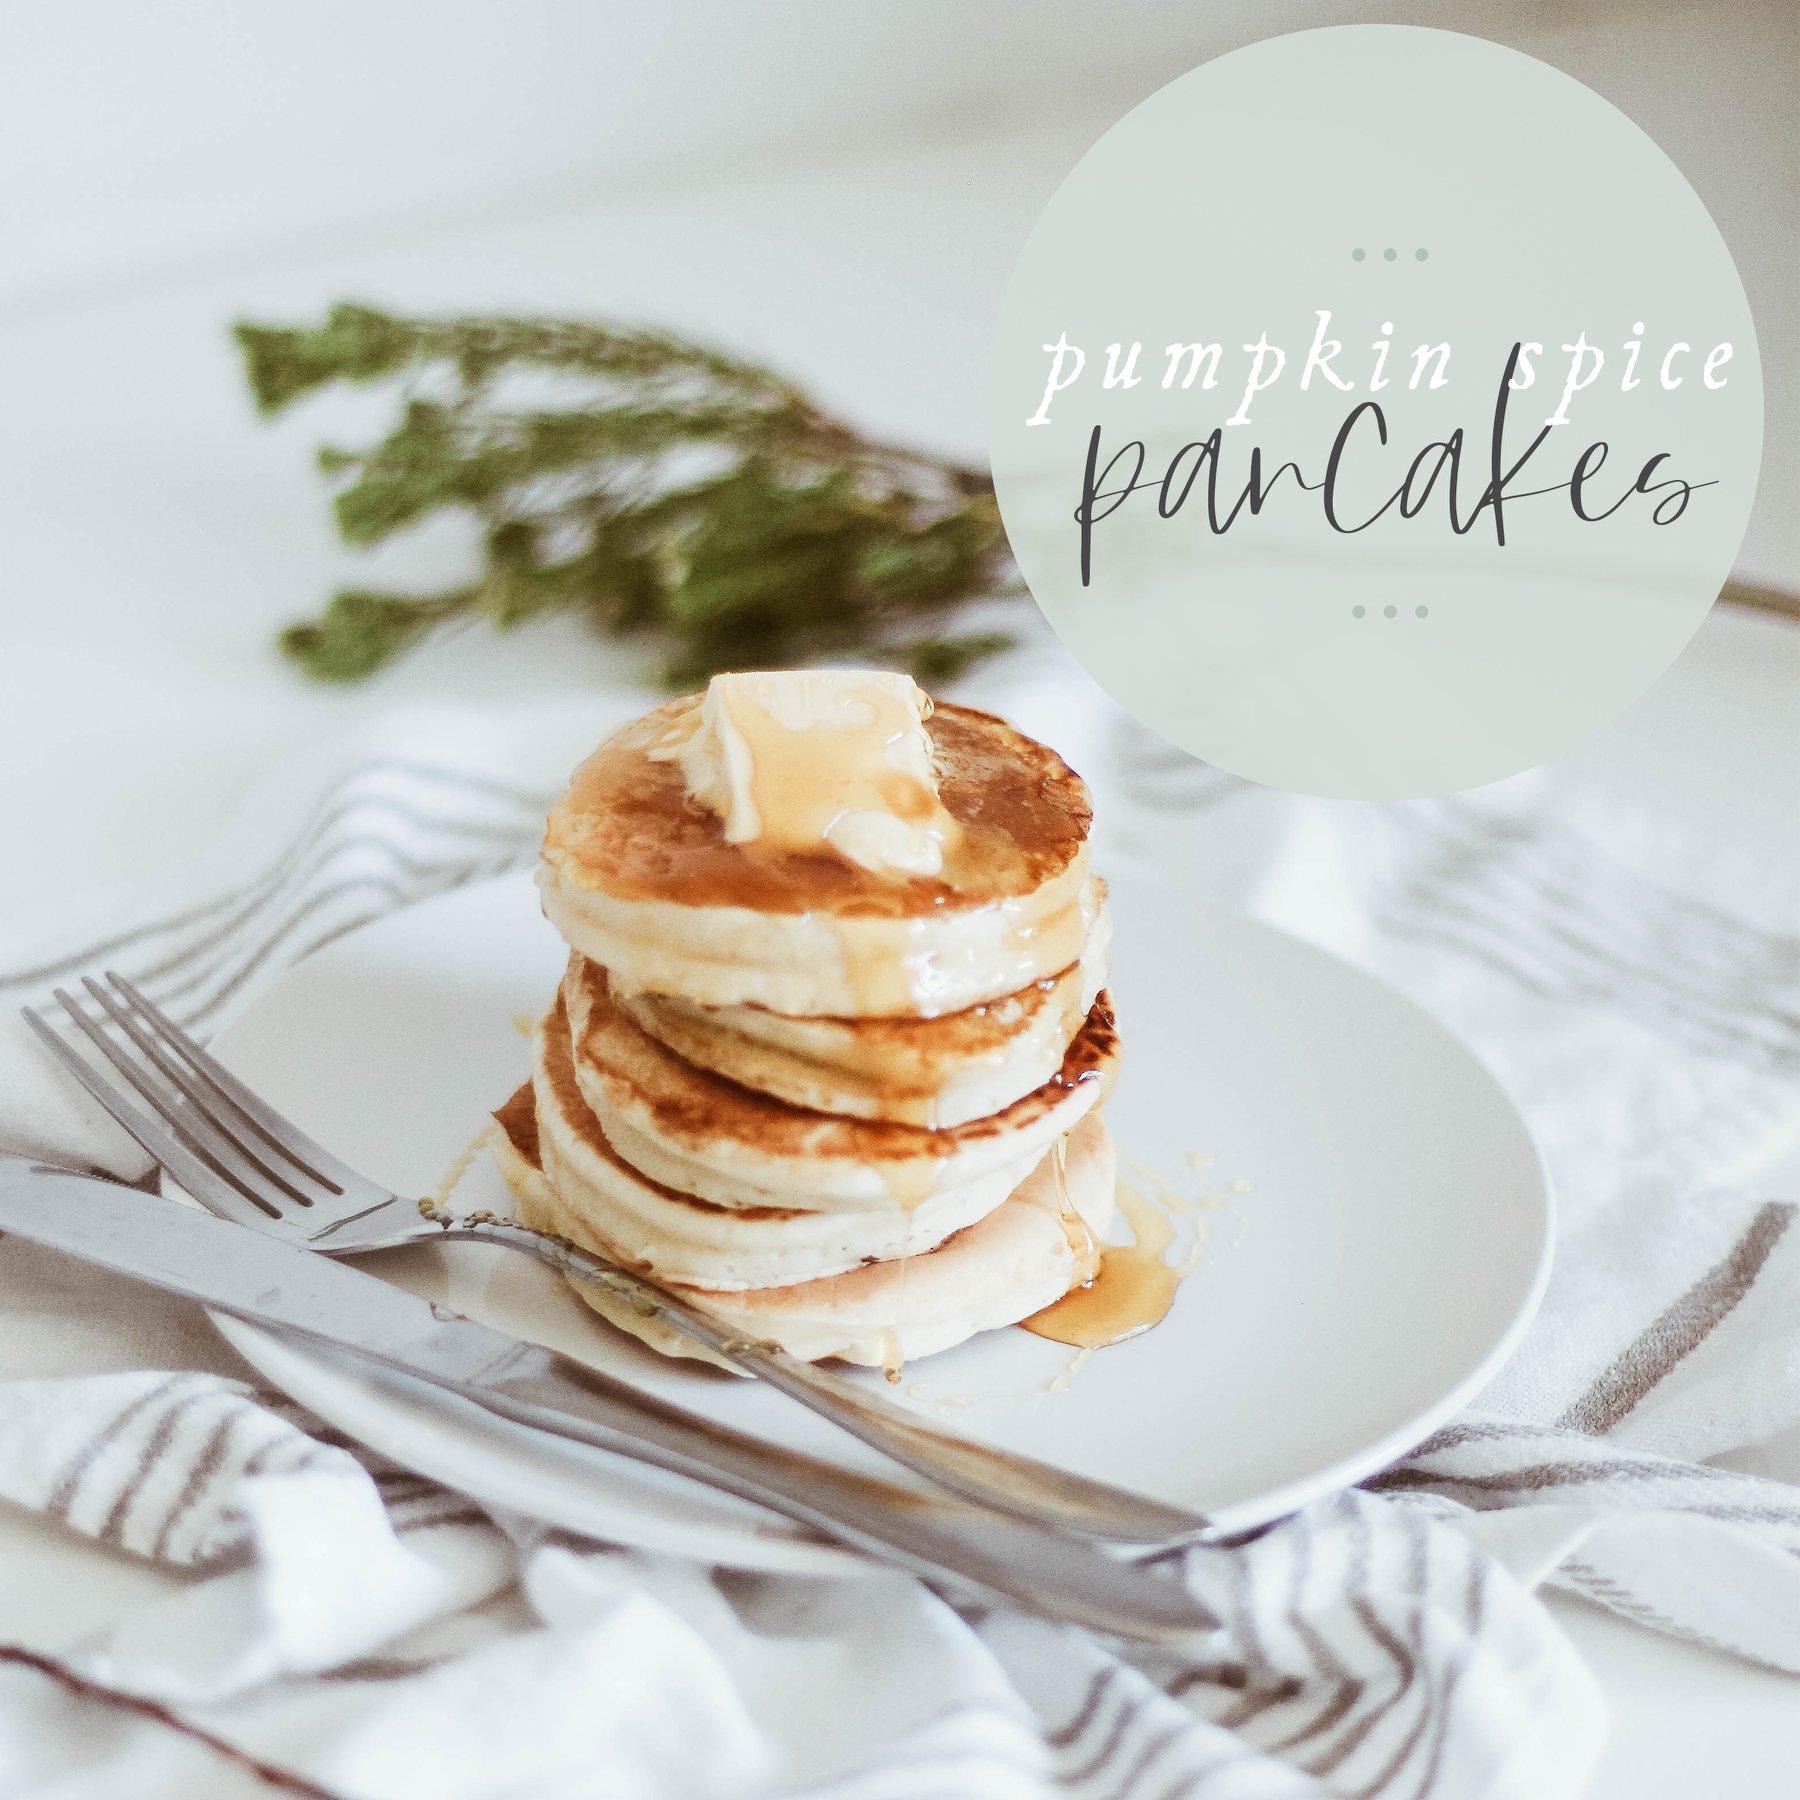 pumpkin spice pancakes